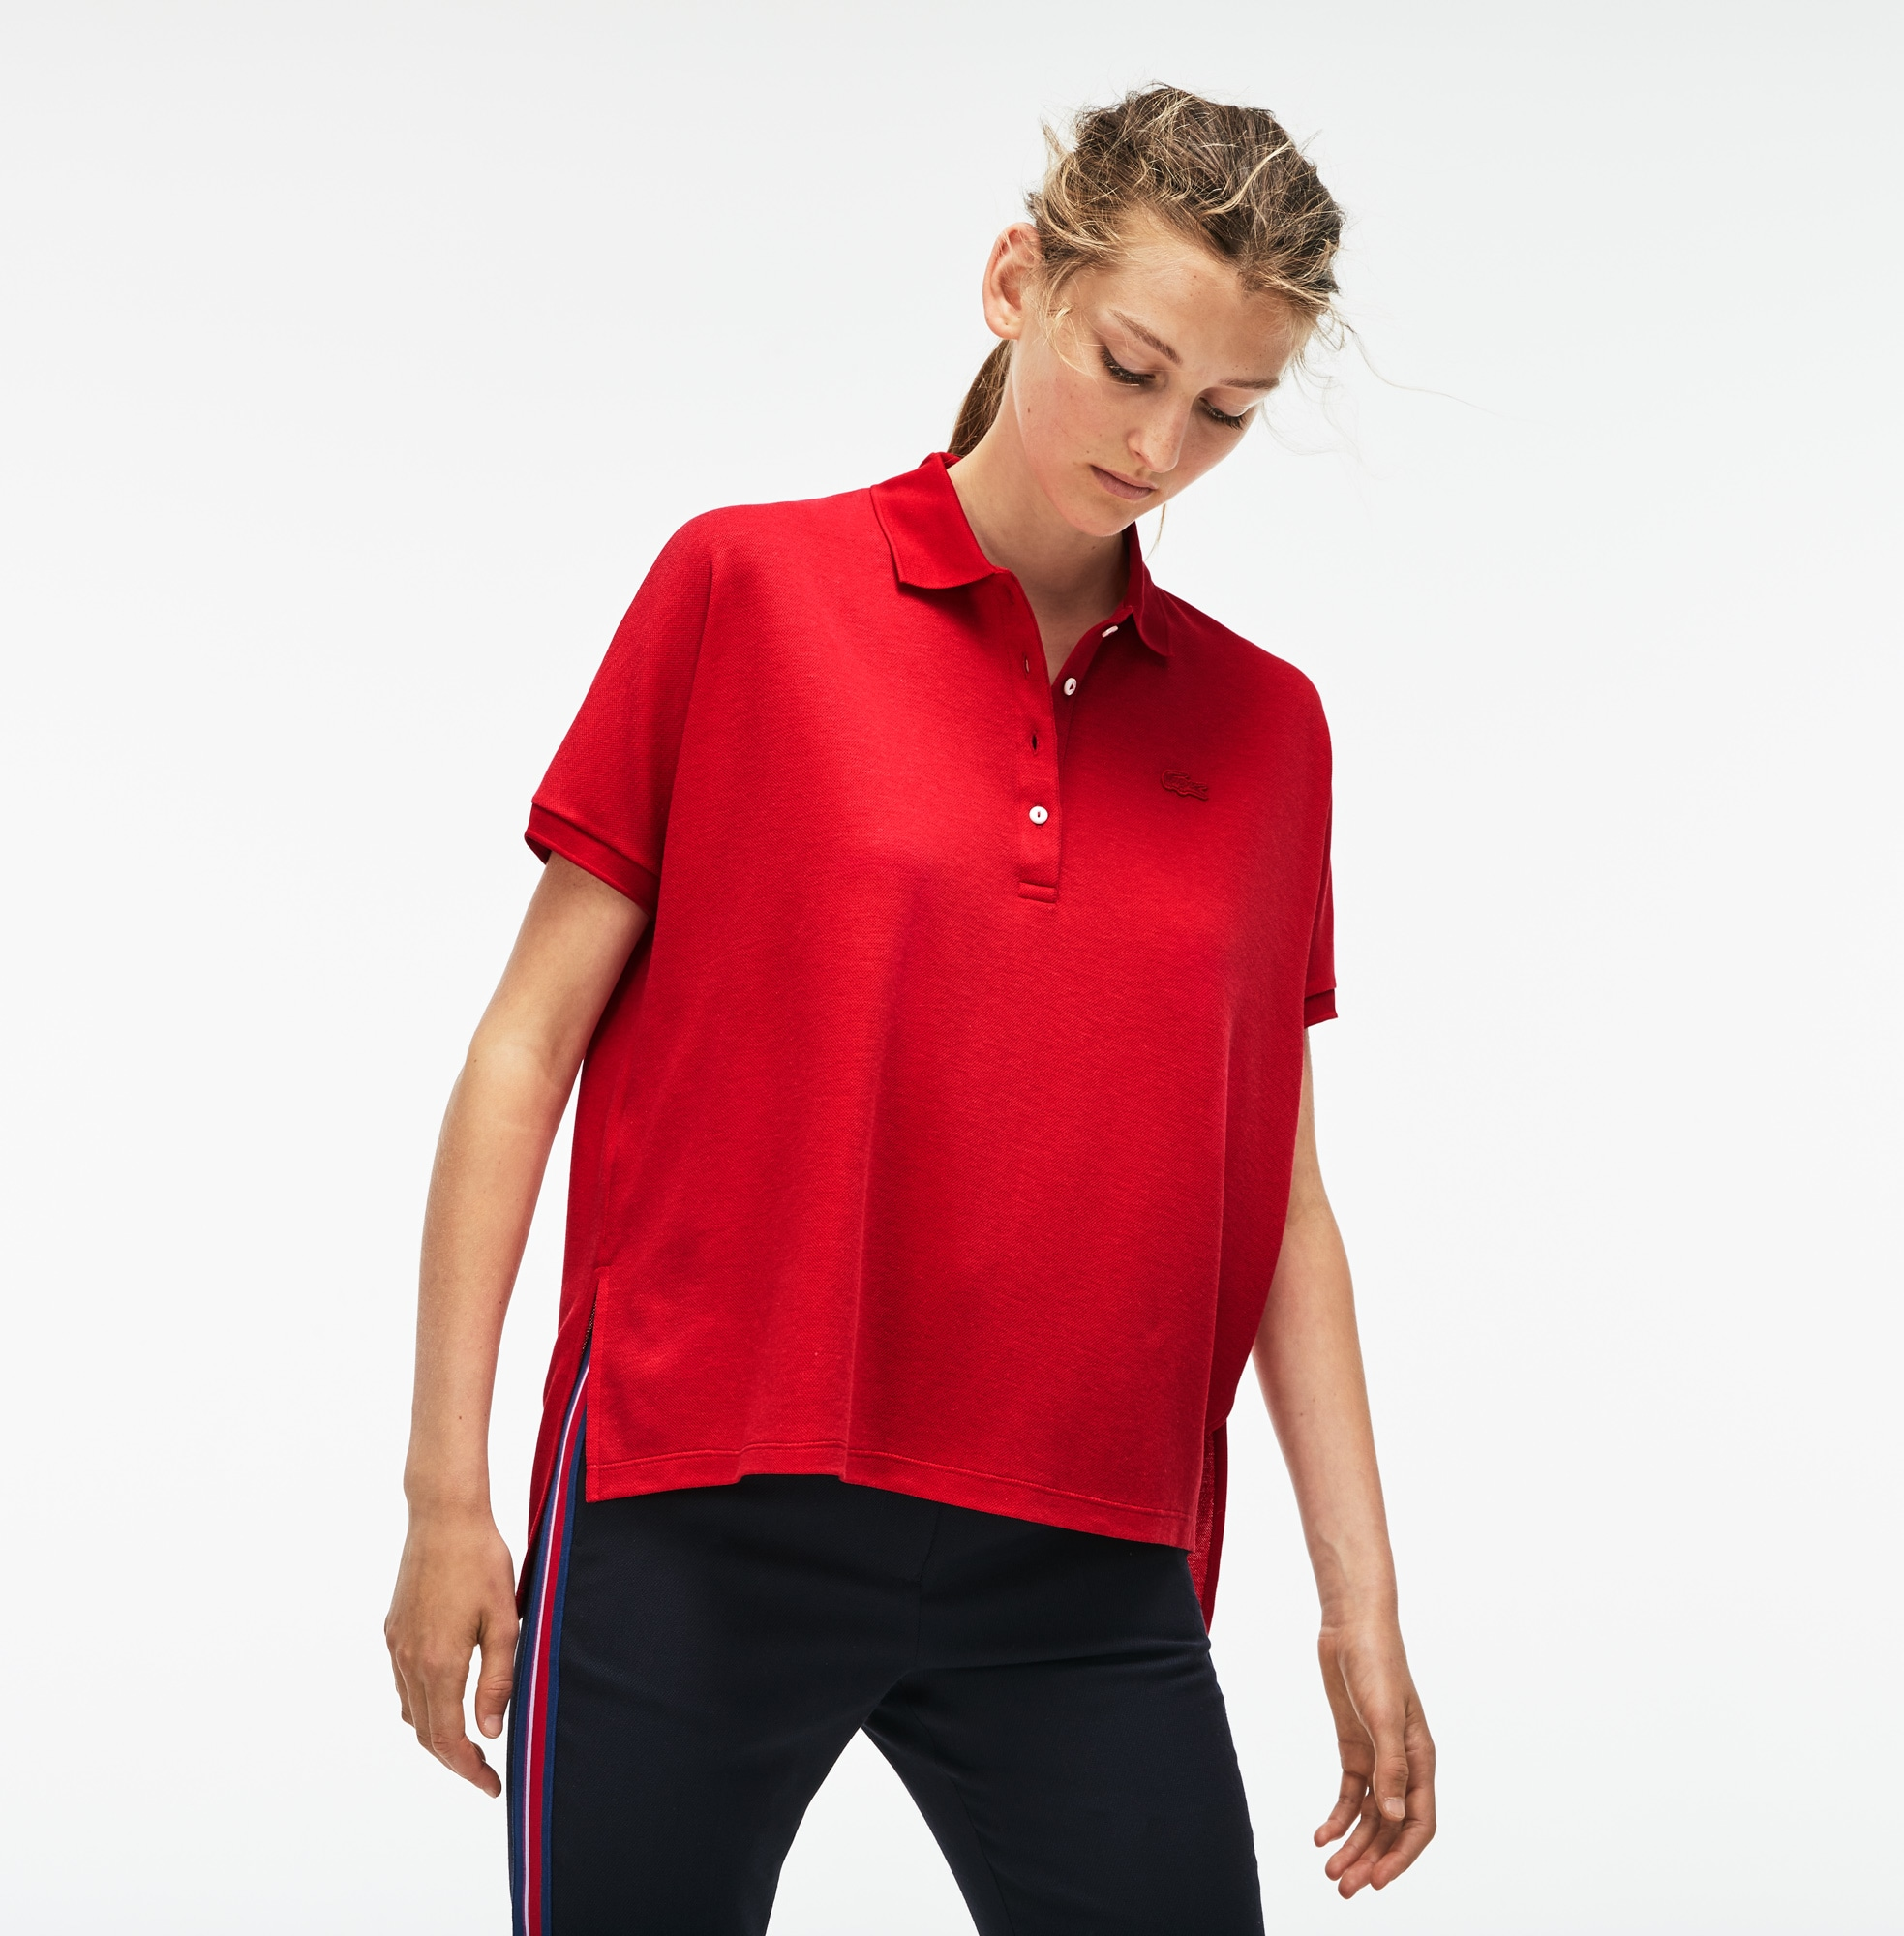 Women's Modern Fit Flowing Stretch Cotton Piqué Polo